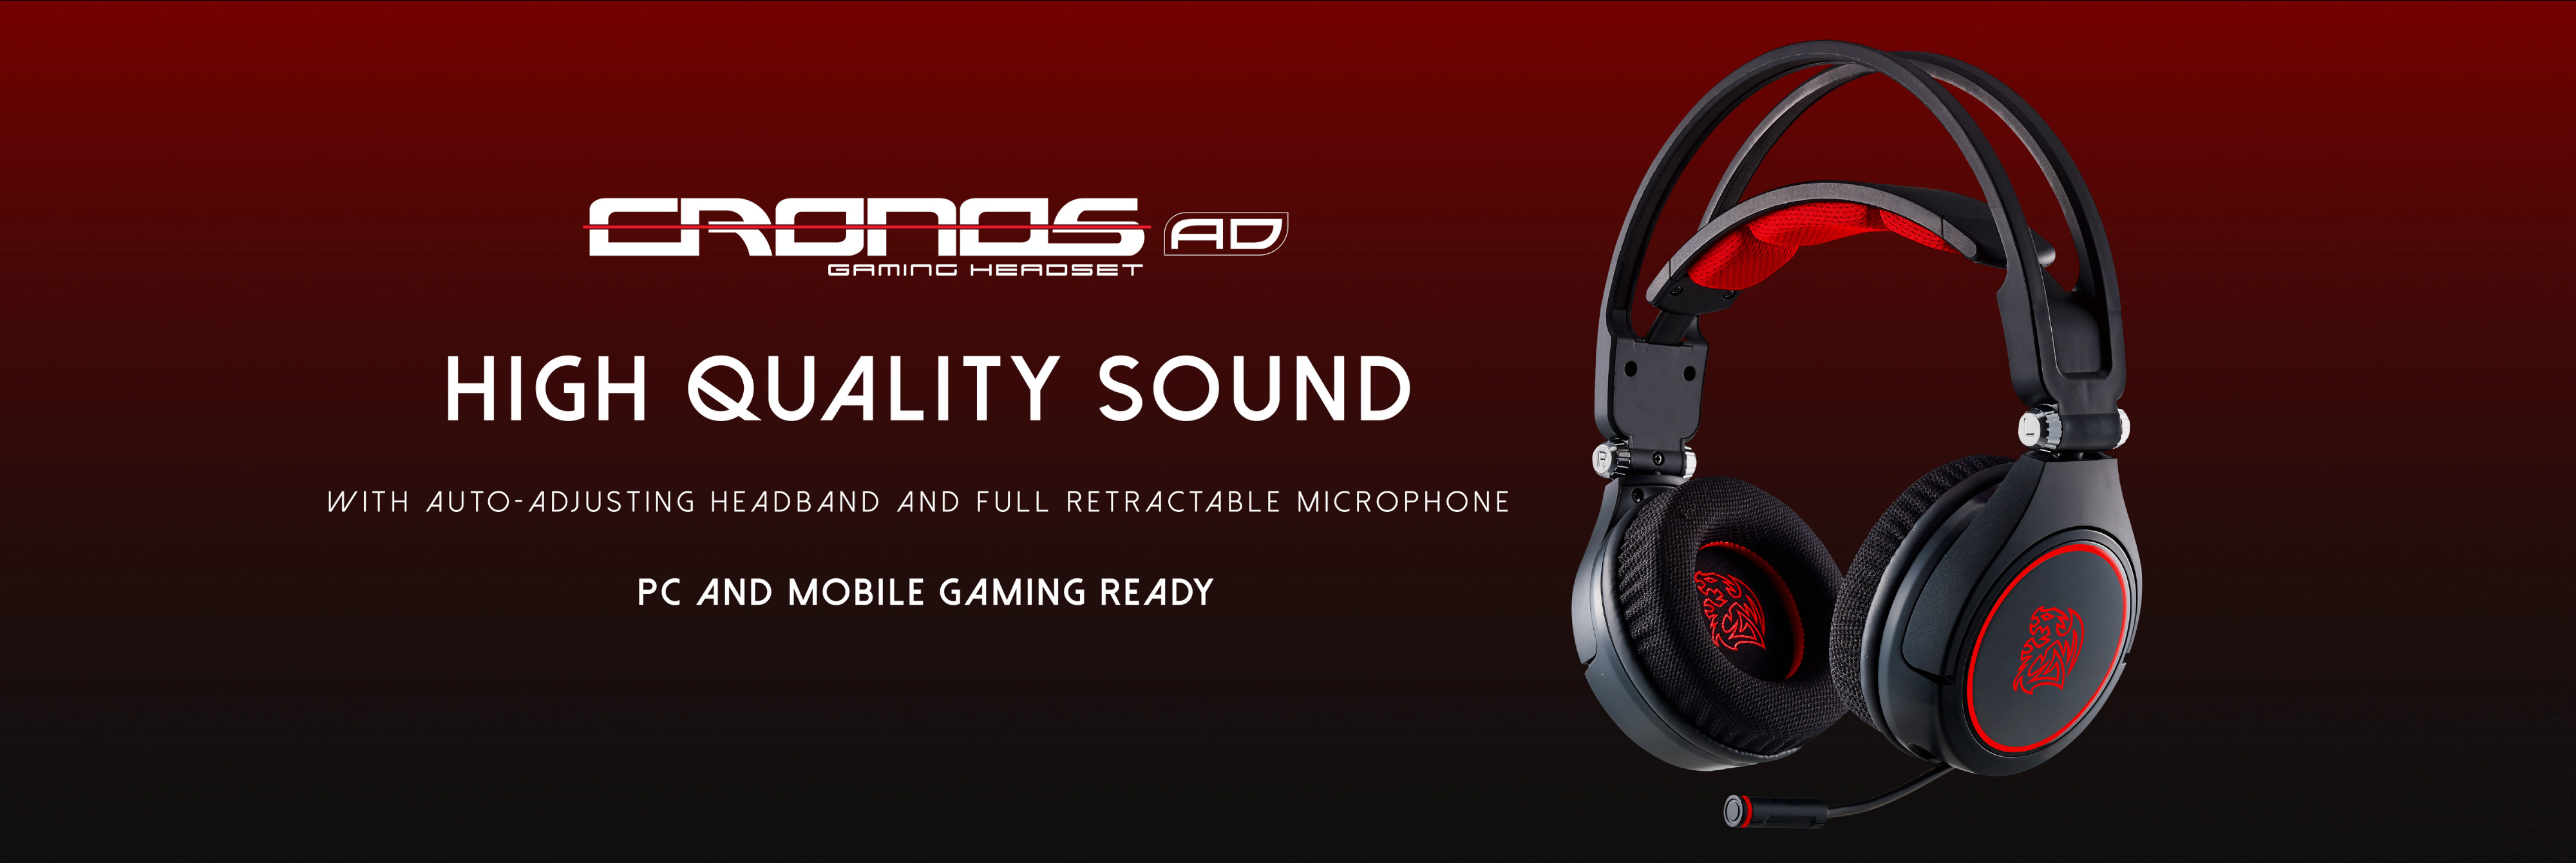 The New Tt eSPORTS CRONOS AD Gaming Headset